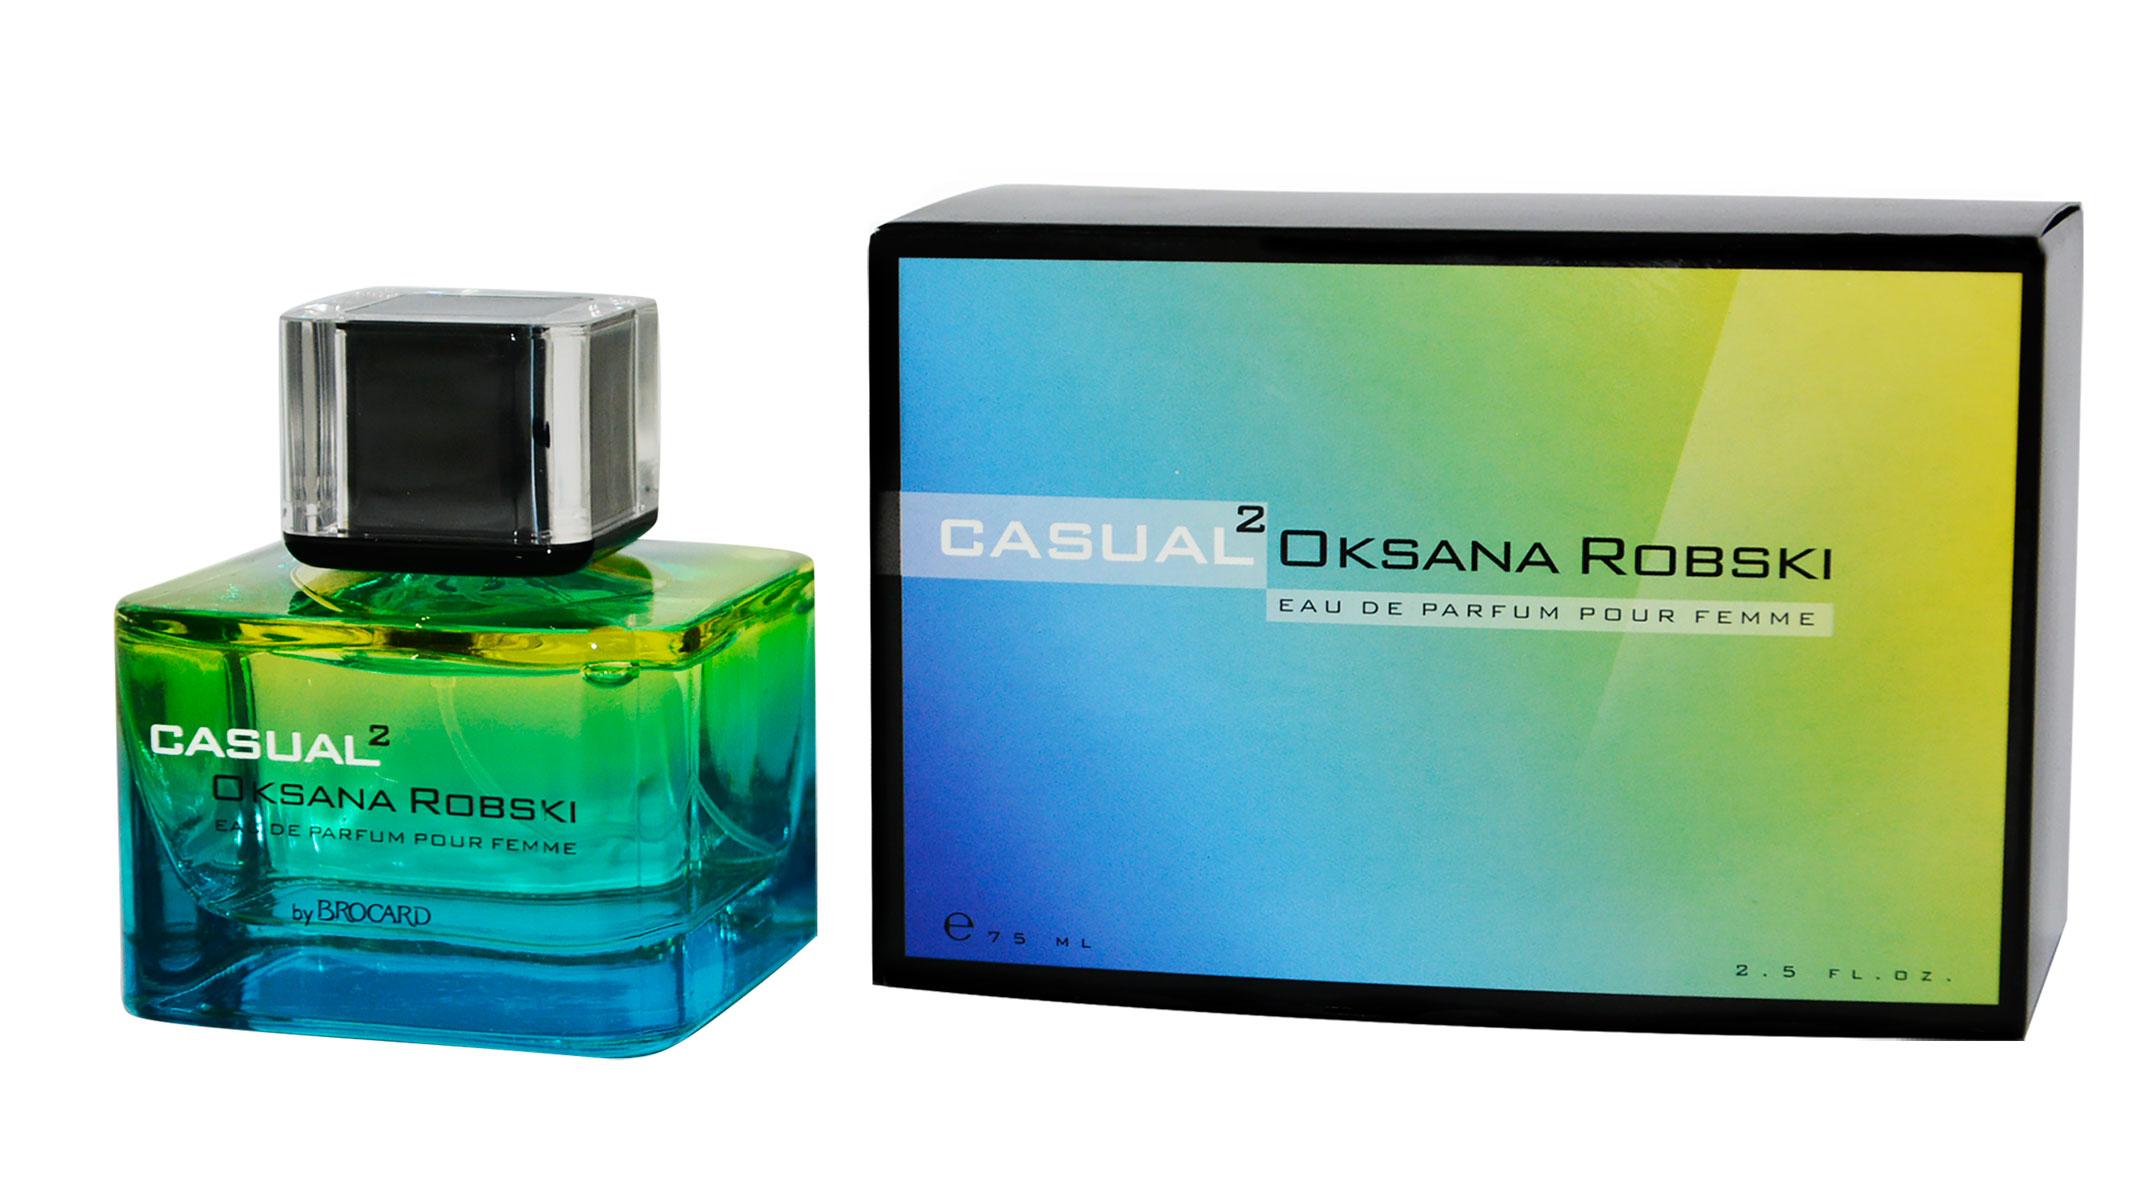 Brocard Oksana Robski Casual 2 парфюмерная вода для женщин, 75 мл каталог oks by oksana demchenko